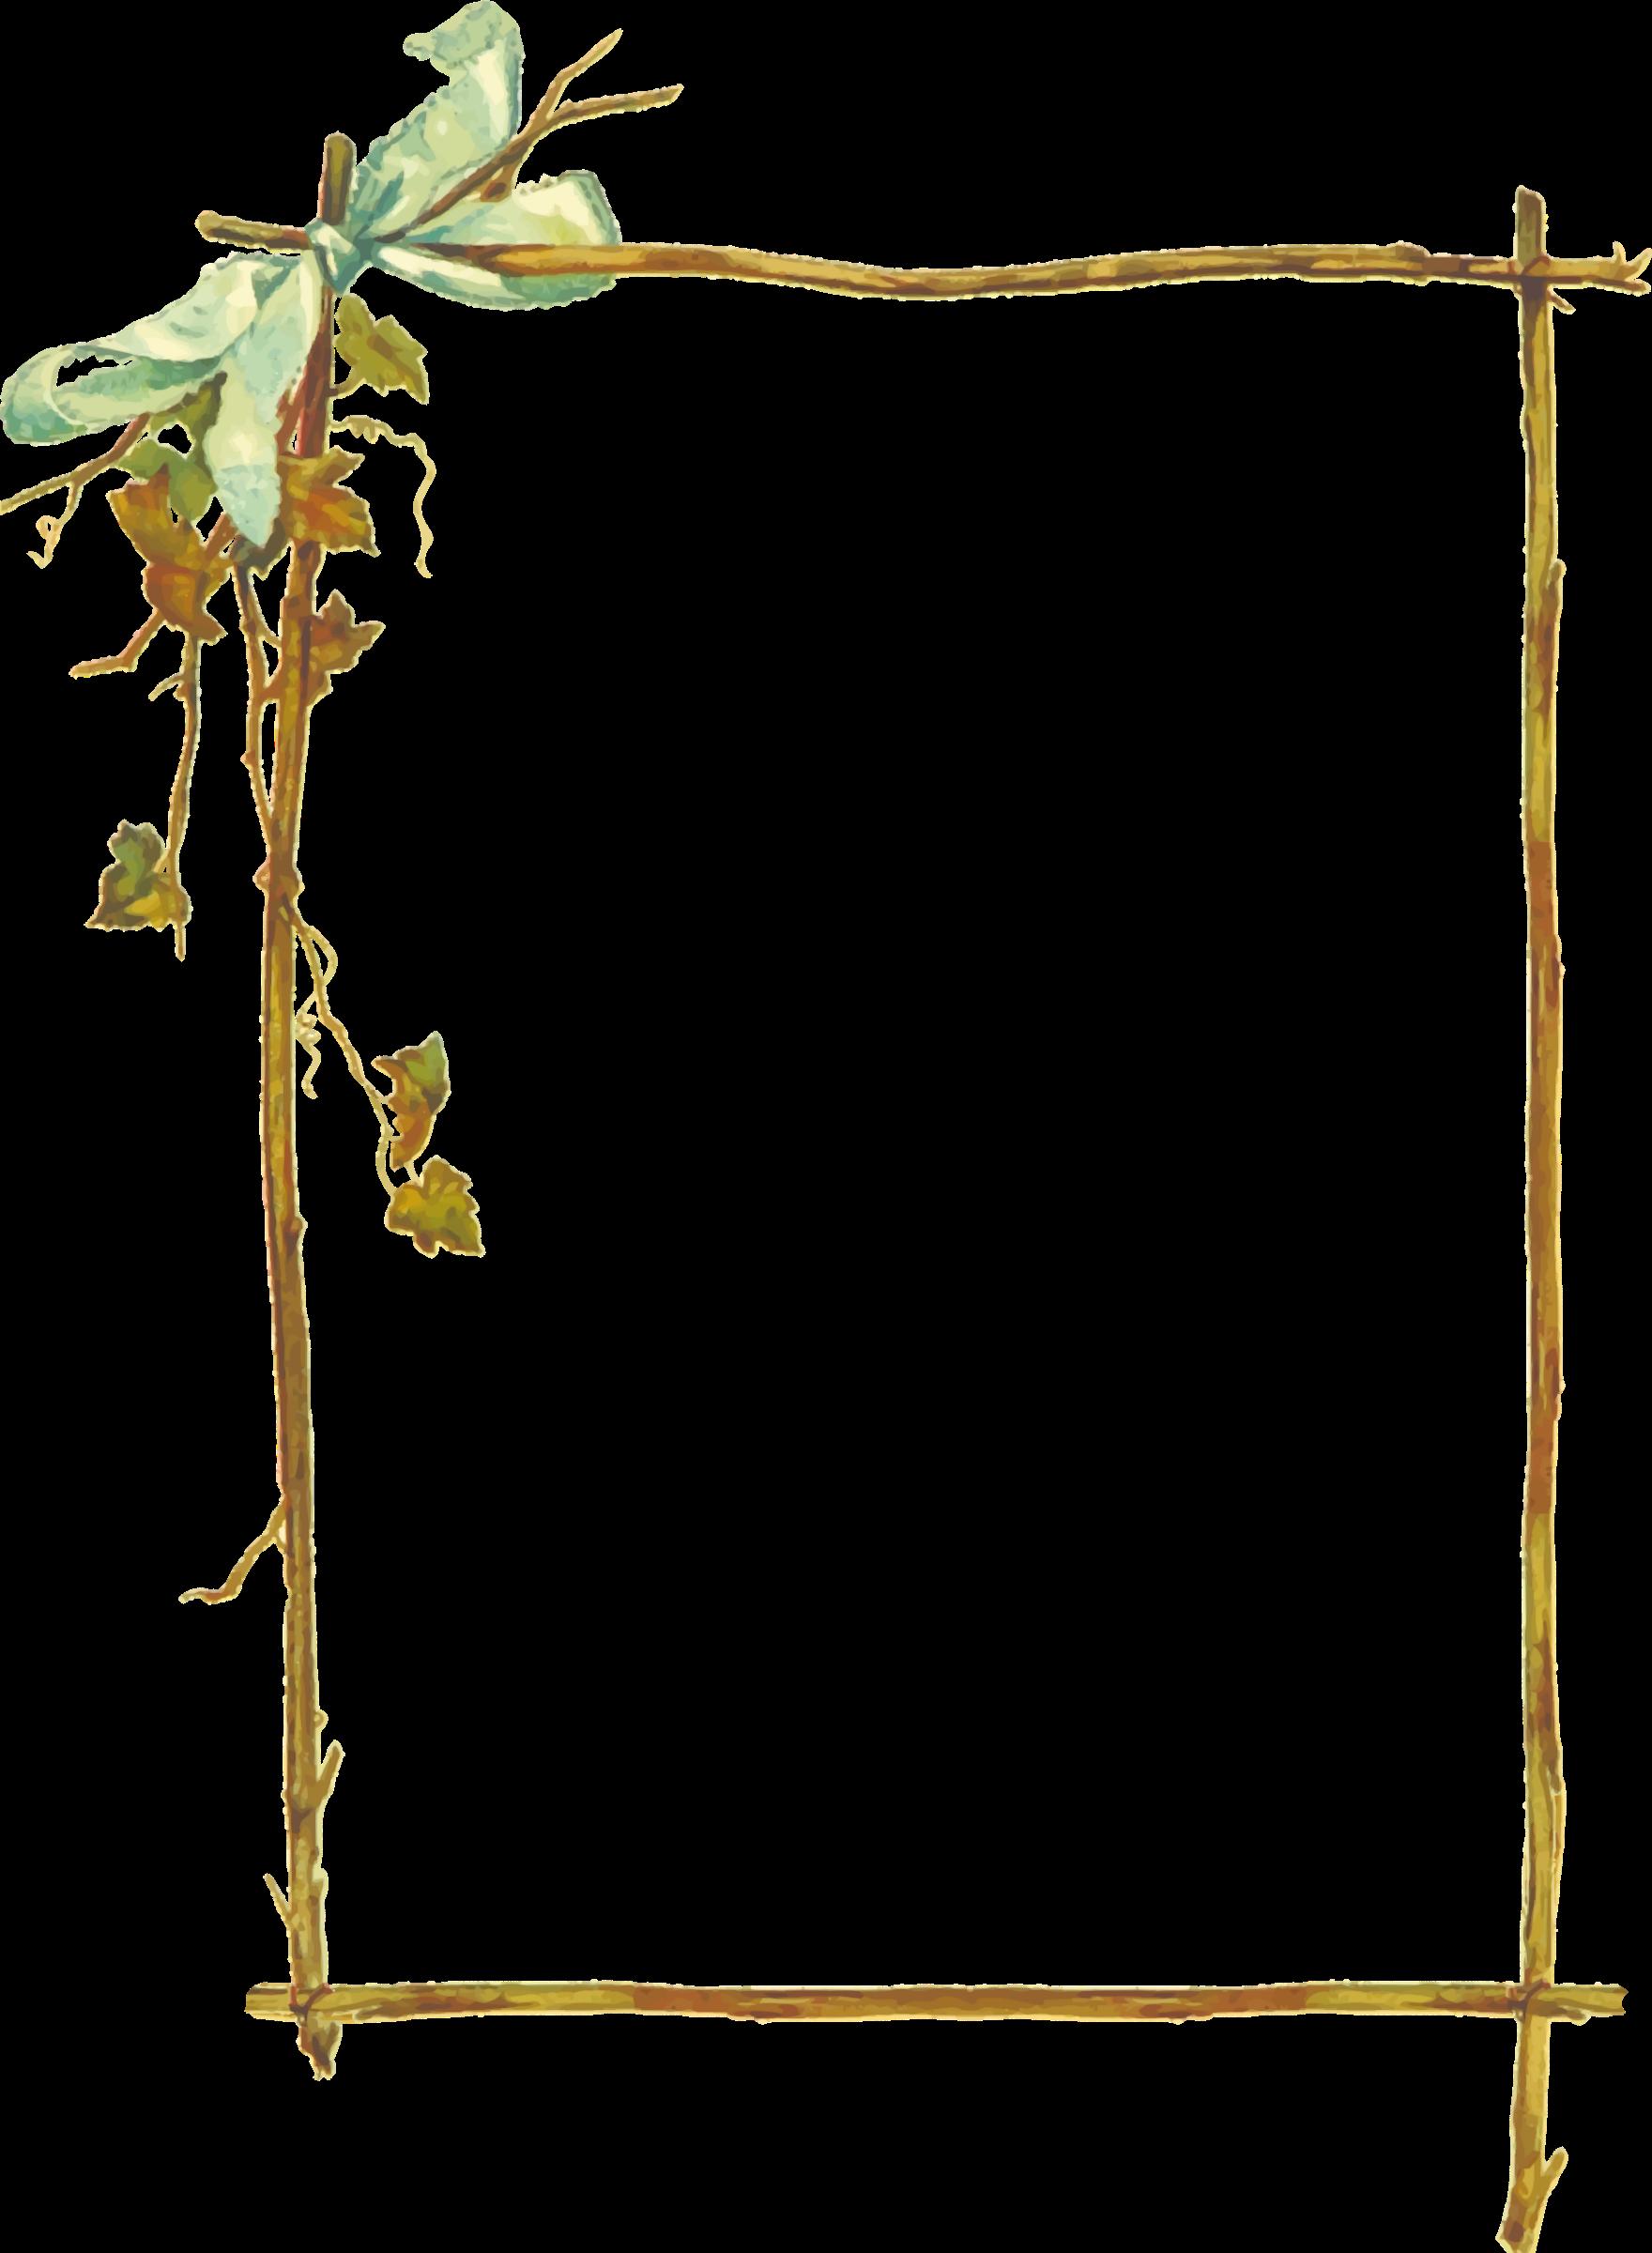 Frame big image png. Branch clipart wooden stick